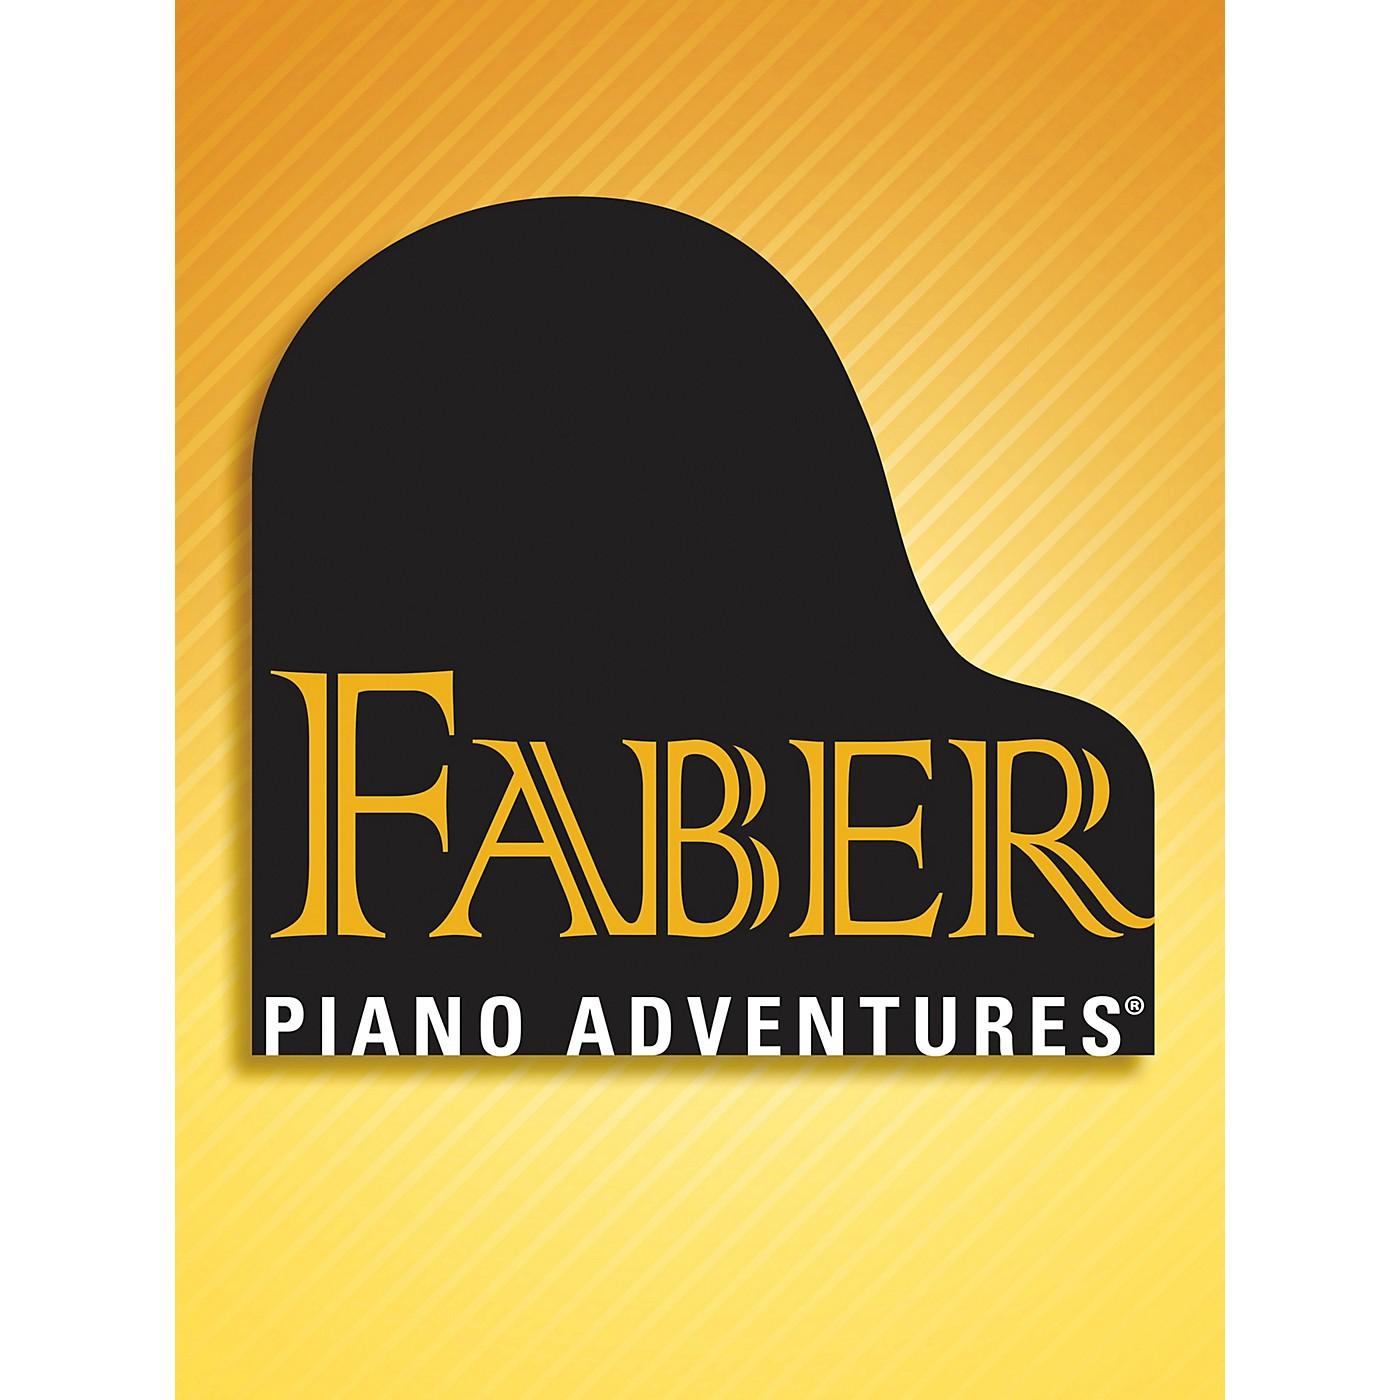 Faber Piano Adventures BigTime® Favorites (Level 4) Faber Piano Adventures® Series Disk thumbnail